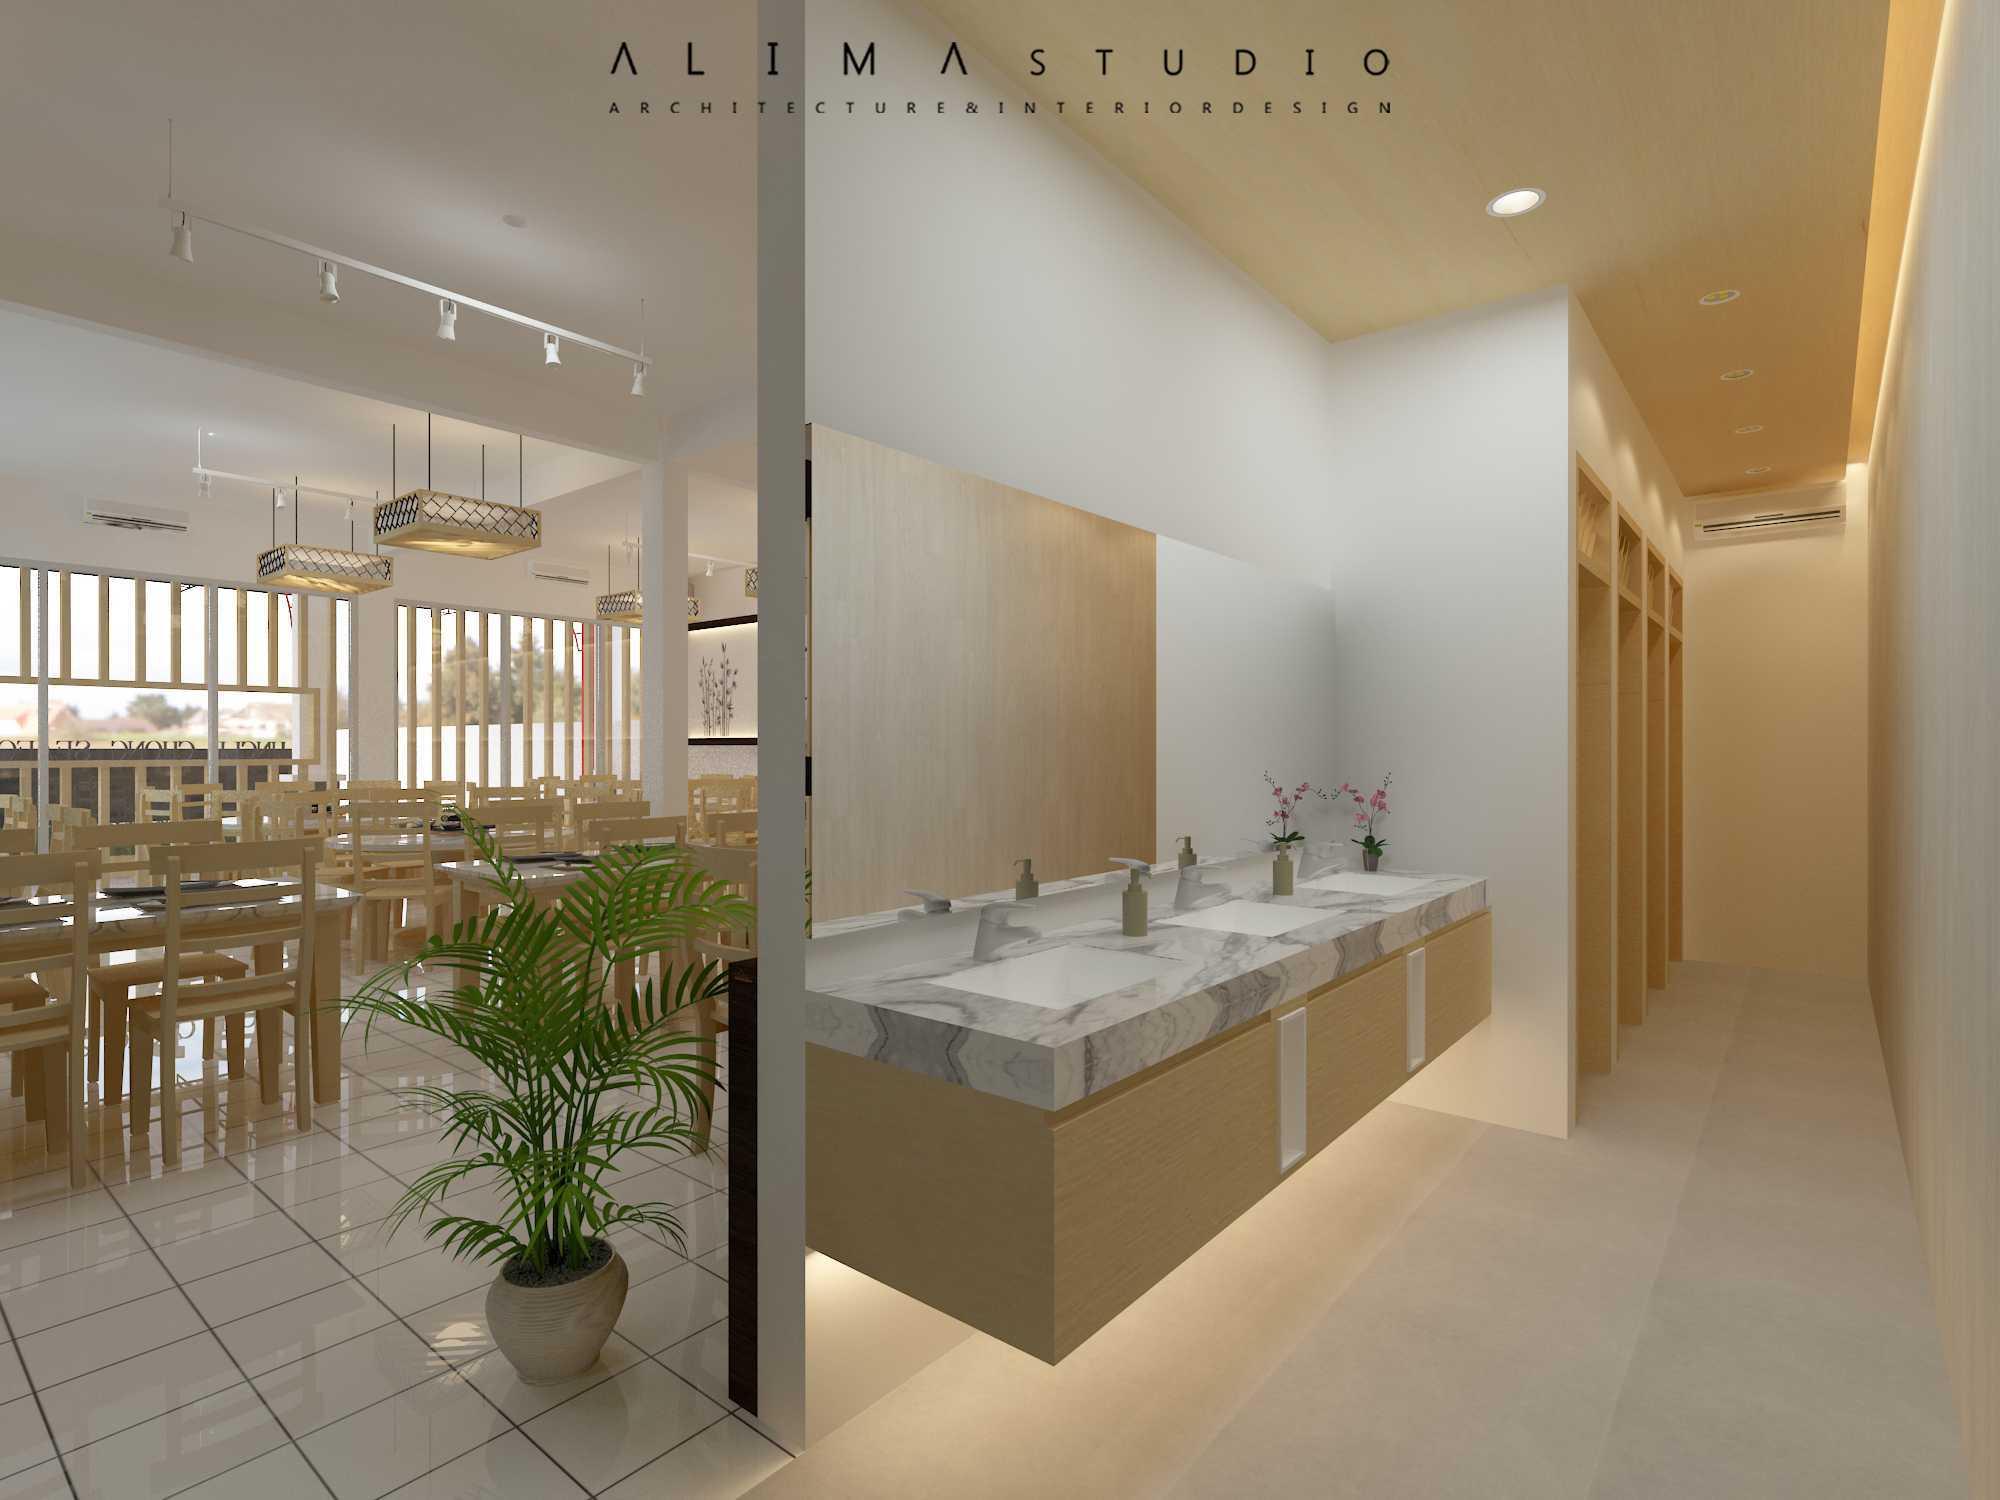 Alima Studio Uncle Chong Restaurant Jl. By Pass Ngurah Rai No.402, Sanur, Denpasar Sel., Bali, 80228, Indonesia Jl. By Pass Ngurah Rai No.402, Sanur, Denpasar Sel., Bali, 80228, Indonesia Alima-Studio-Uncle-Chong-Restaurant Asian  61861